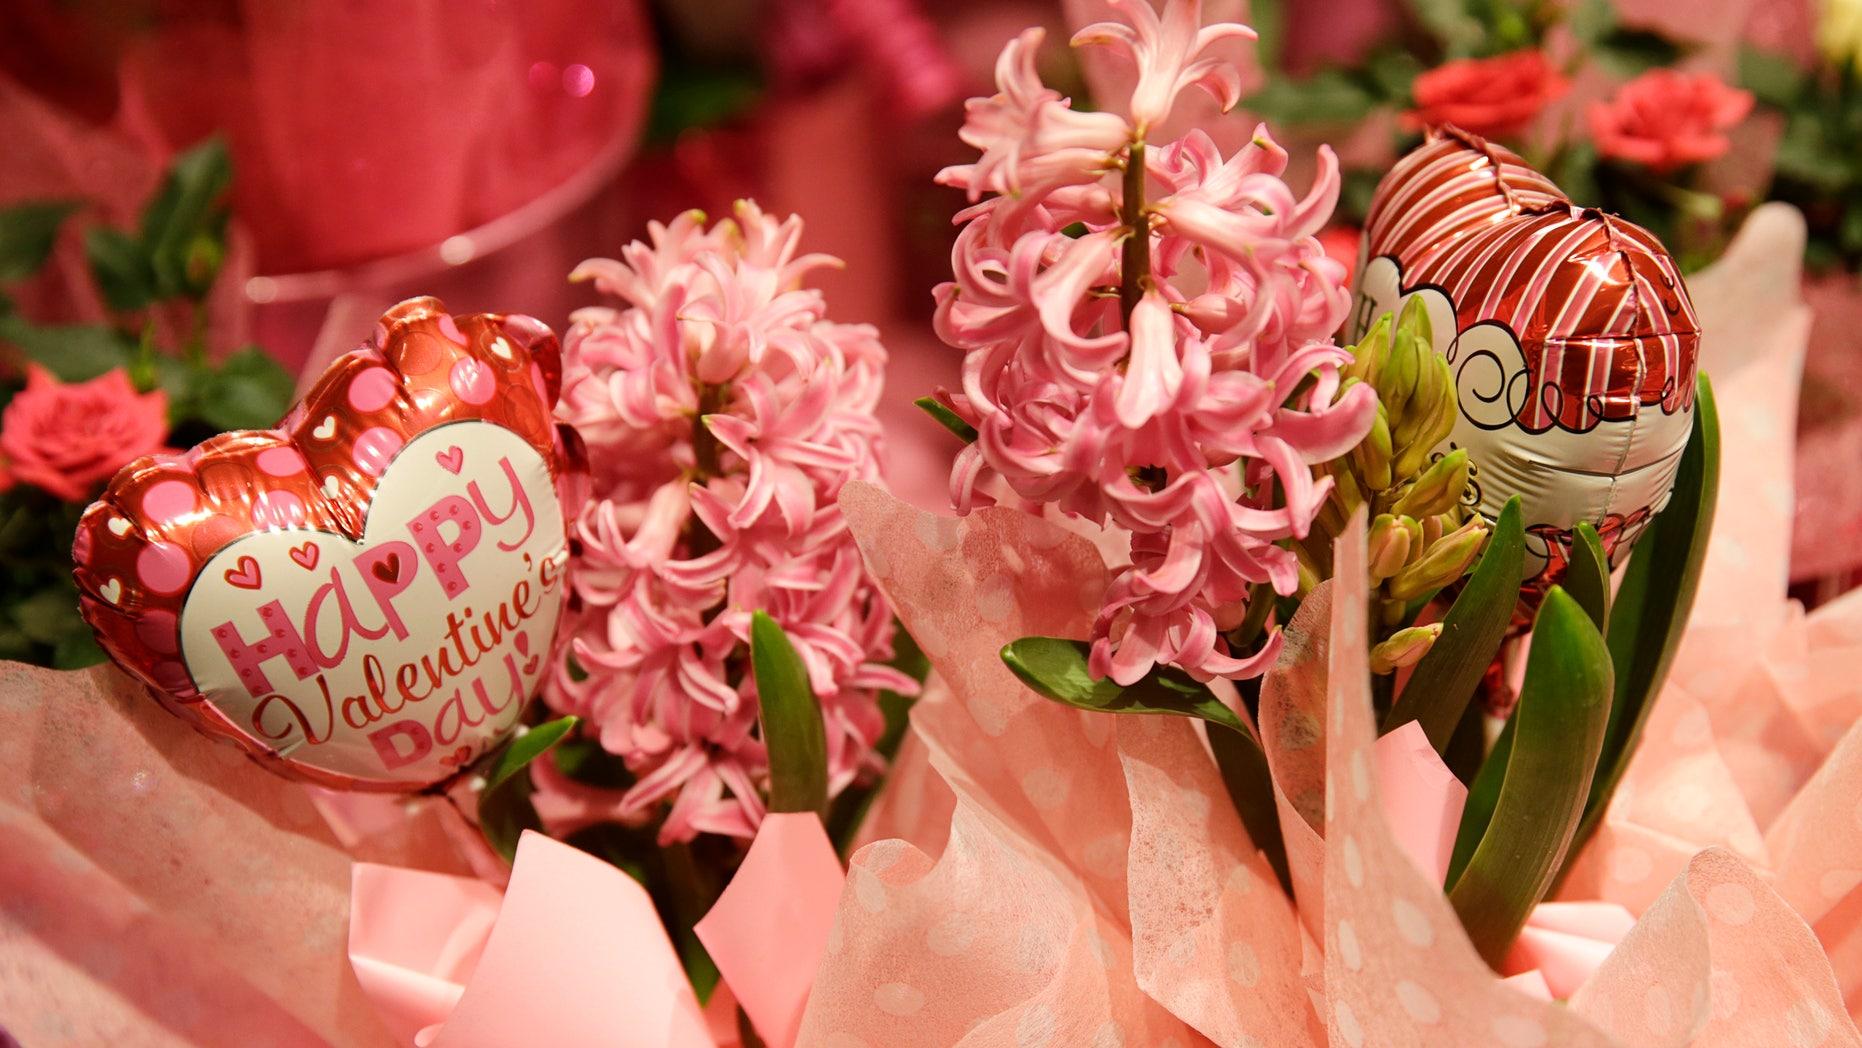 People around the world celebrate Valentine's Day.